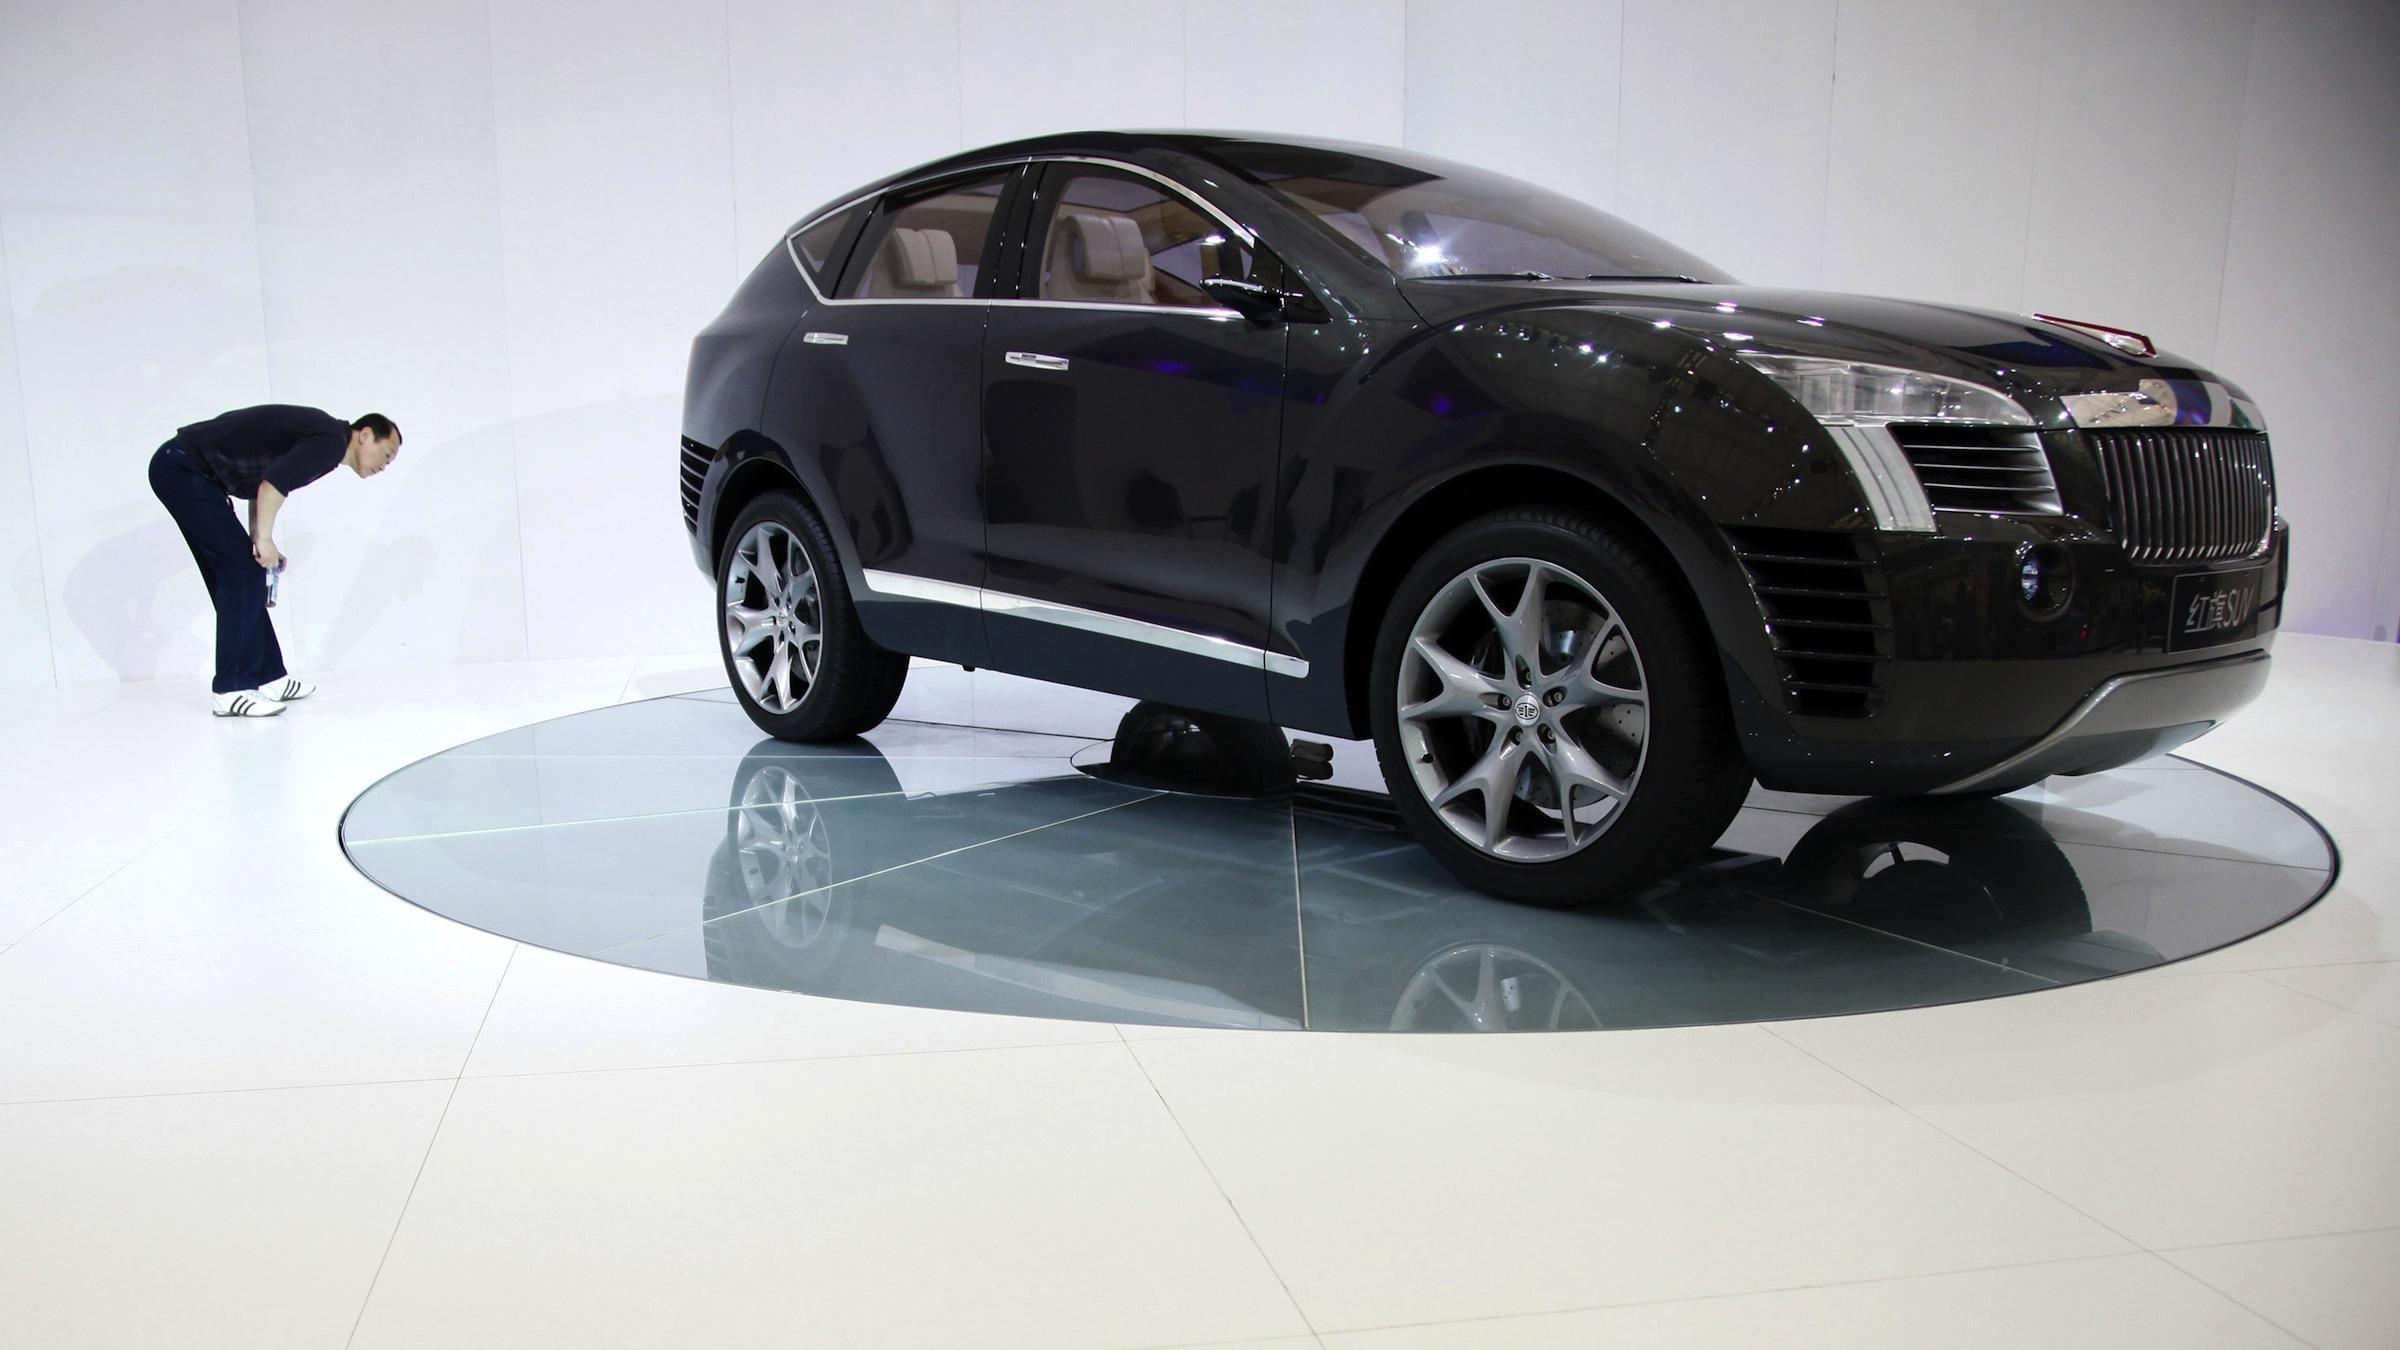 SUV Concept car at the Shanghai International Auto Show